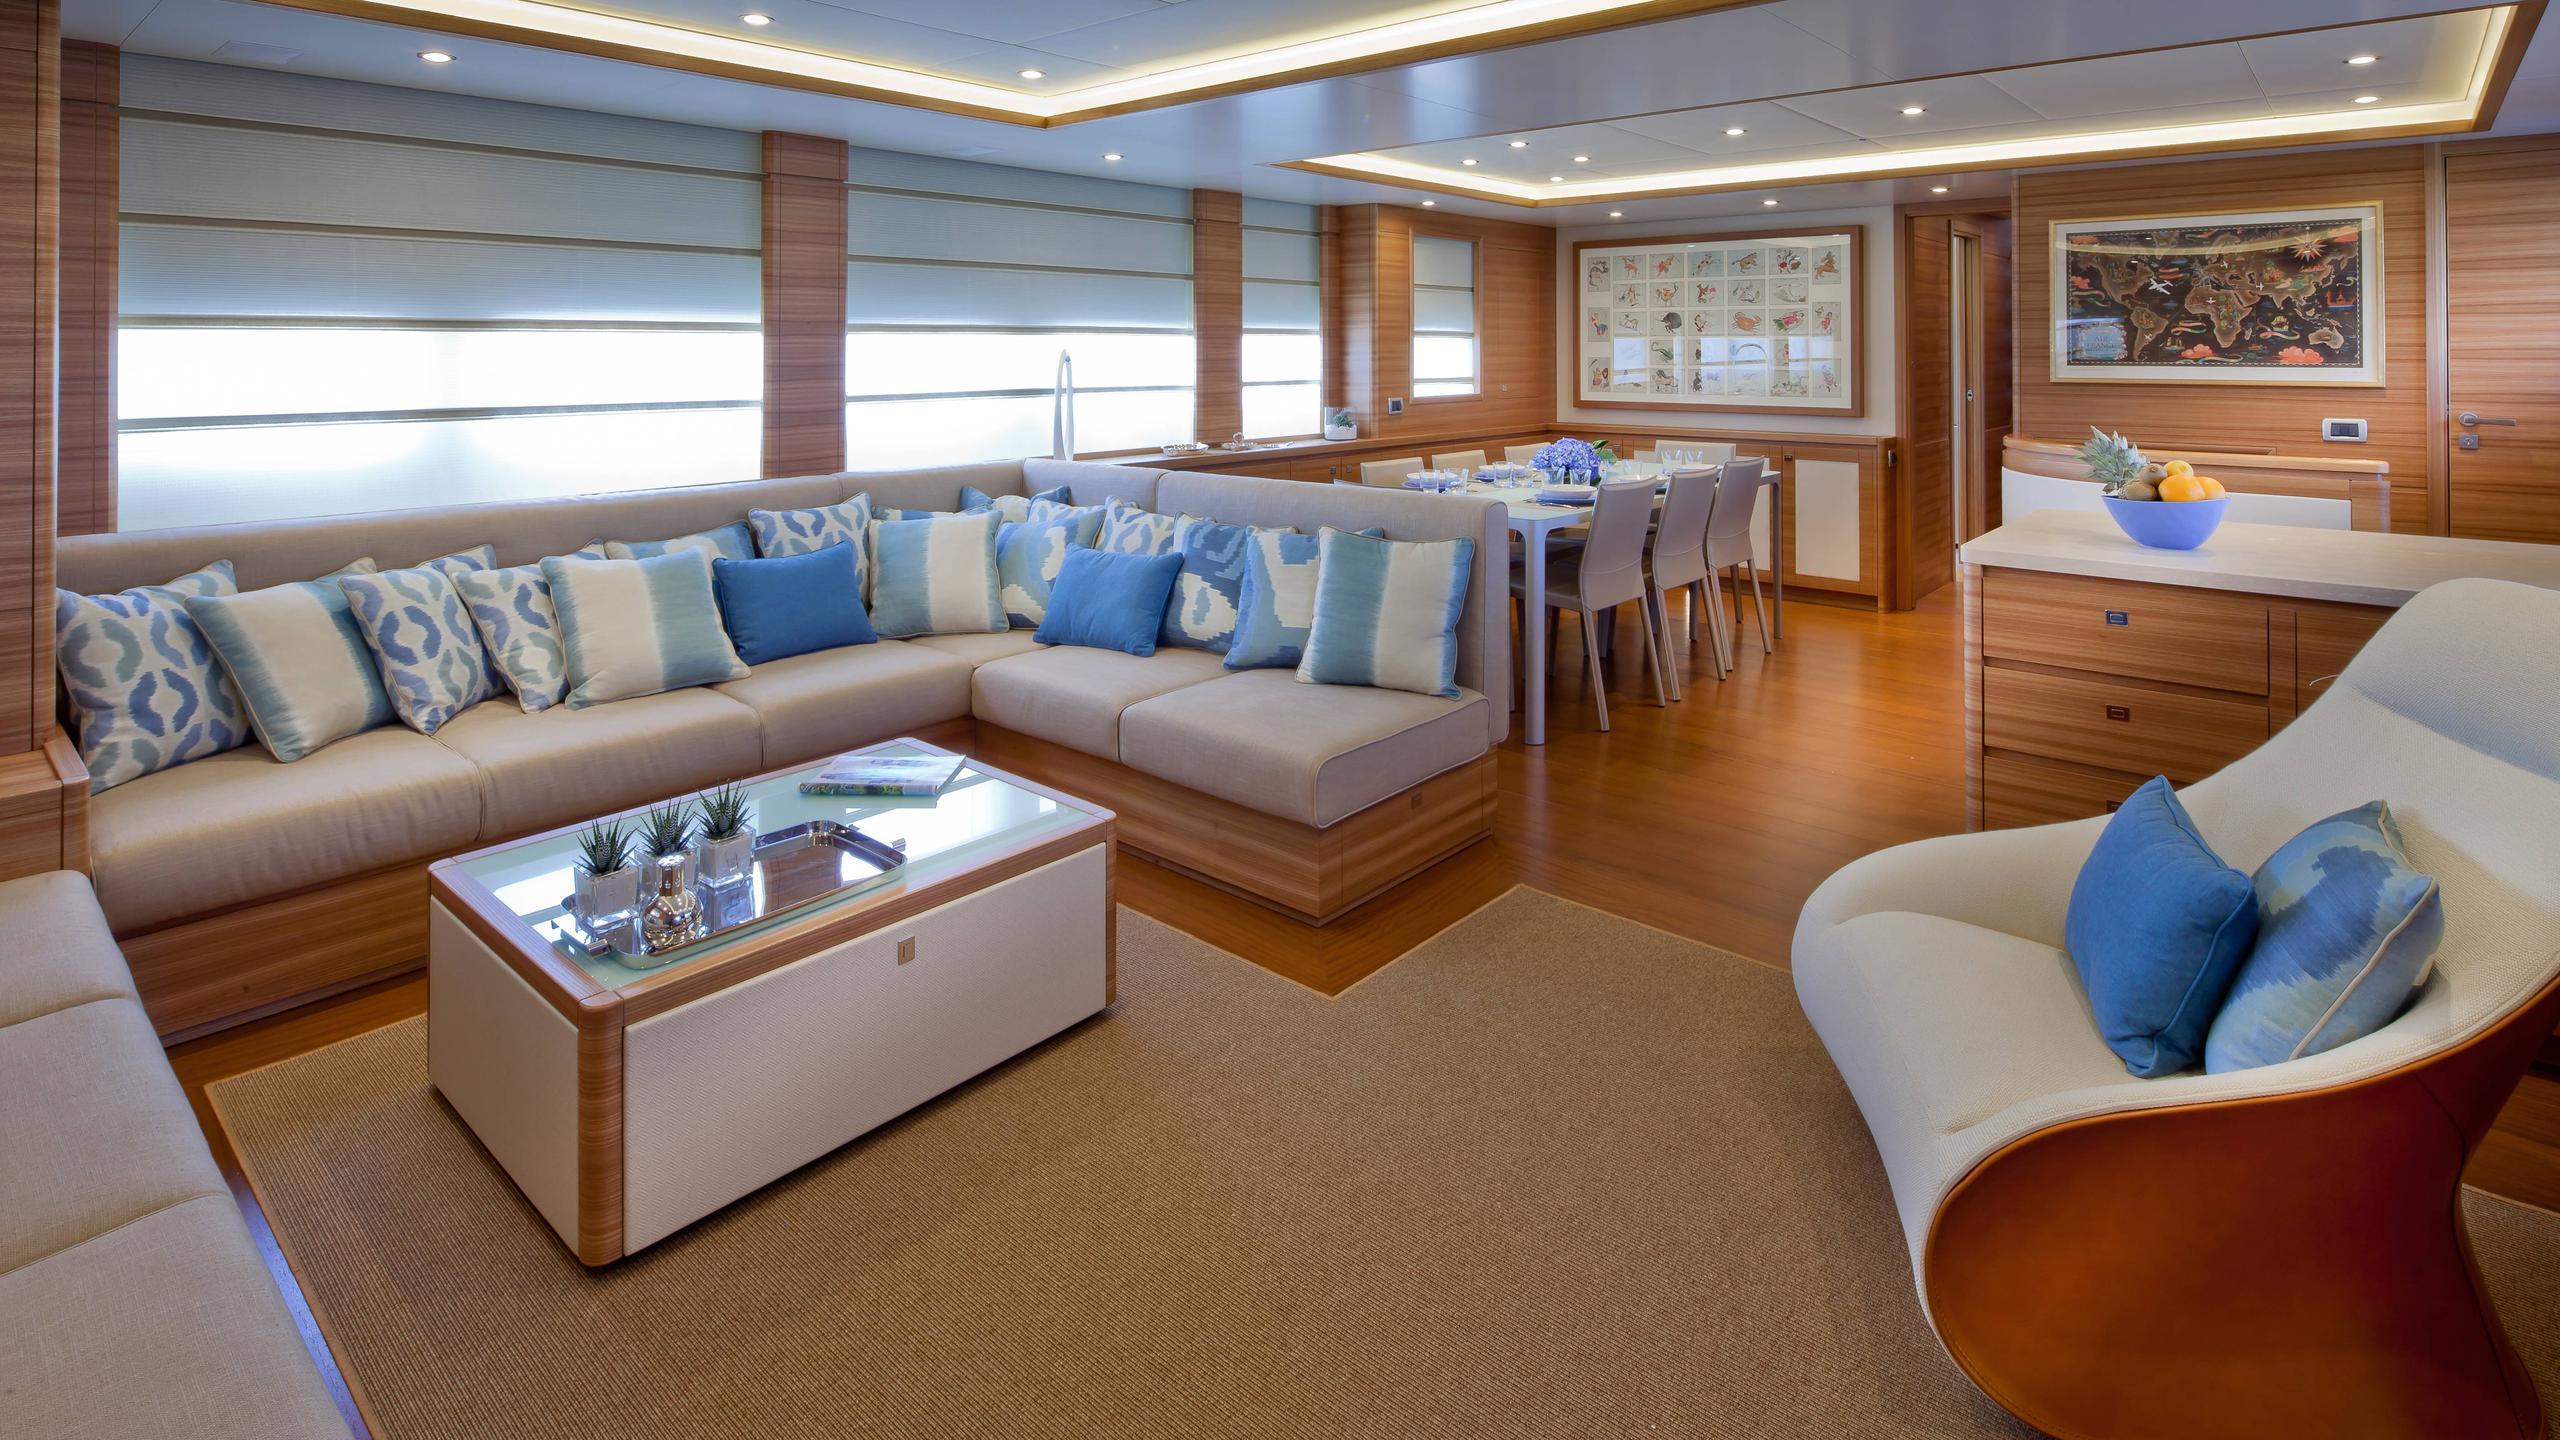 percheron-motor-yacht-cantiere-delle-marche-darwin-86-2012-26m-saloon